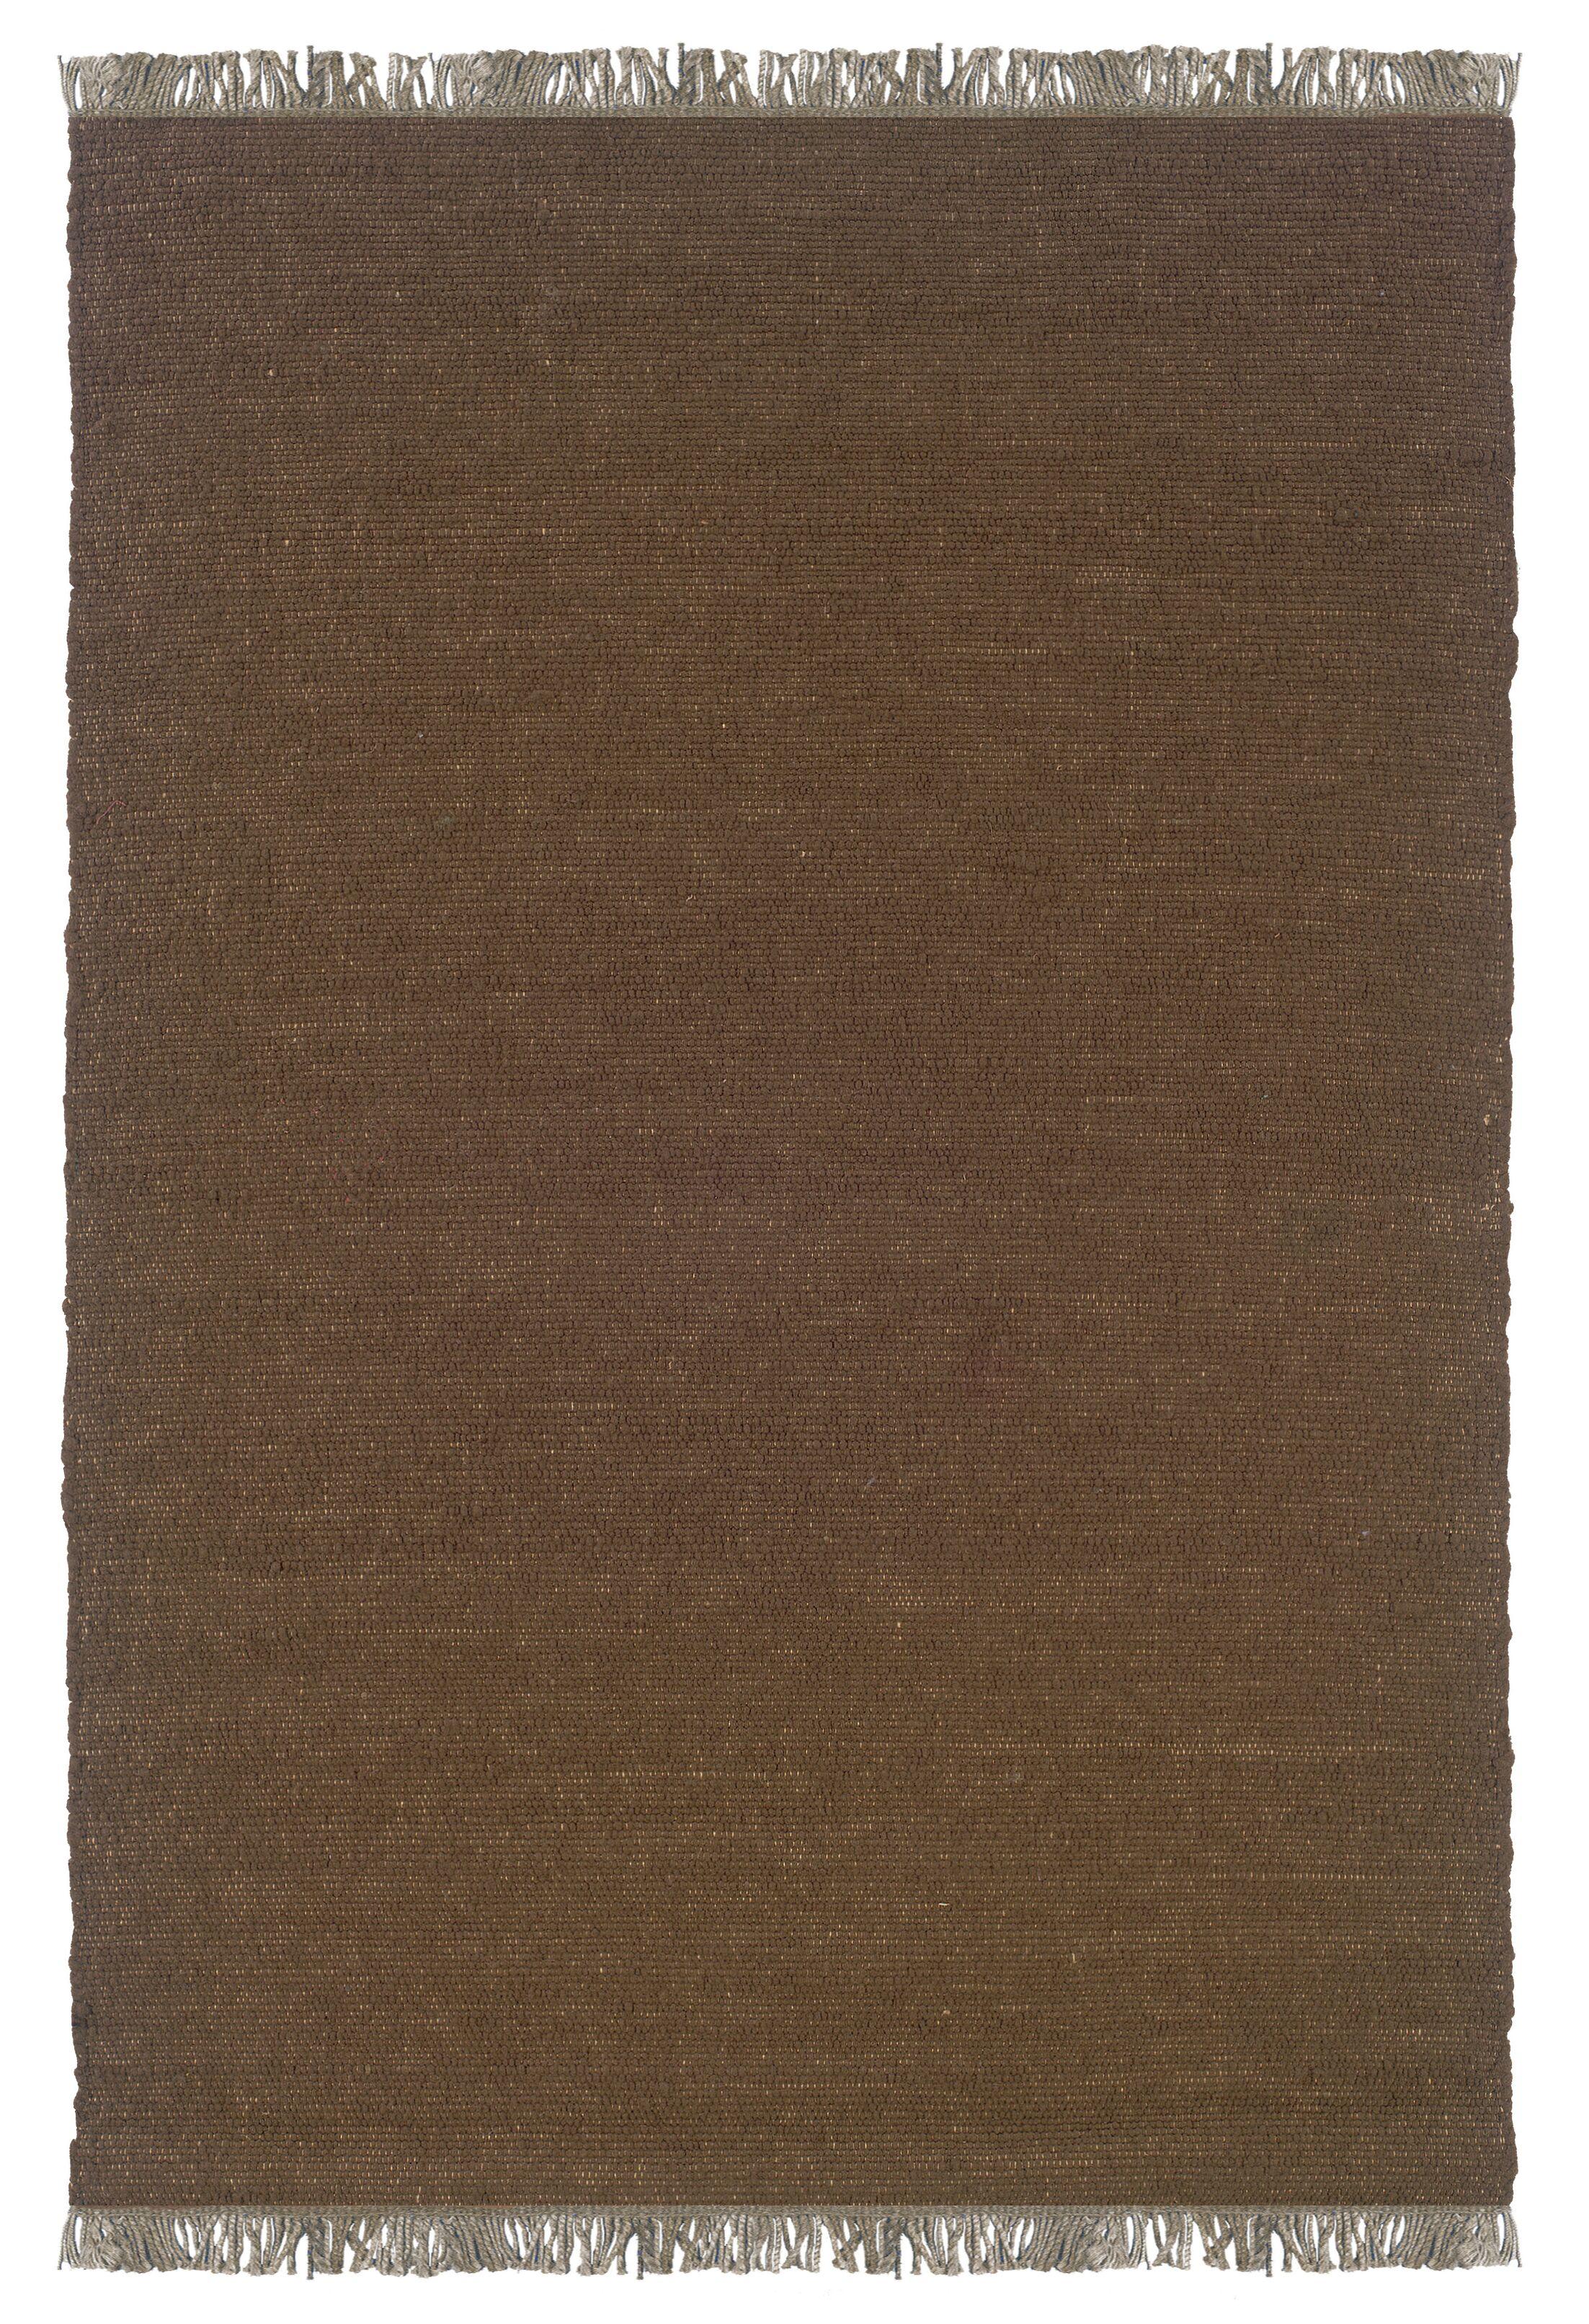 Landenberg Hand-Woven Cocoa Area Rug Rug Size: Rectangle 5'3